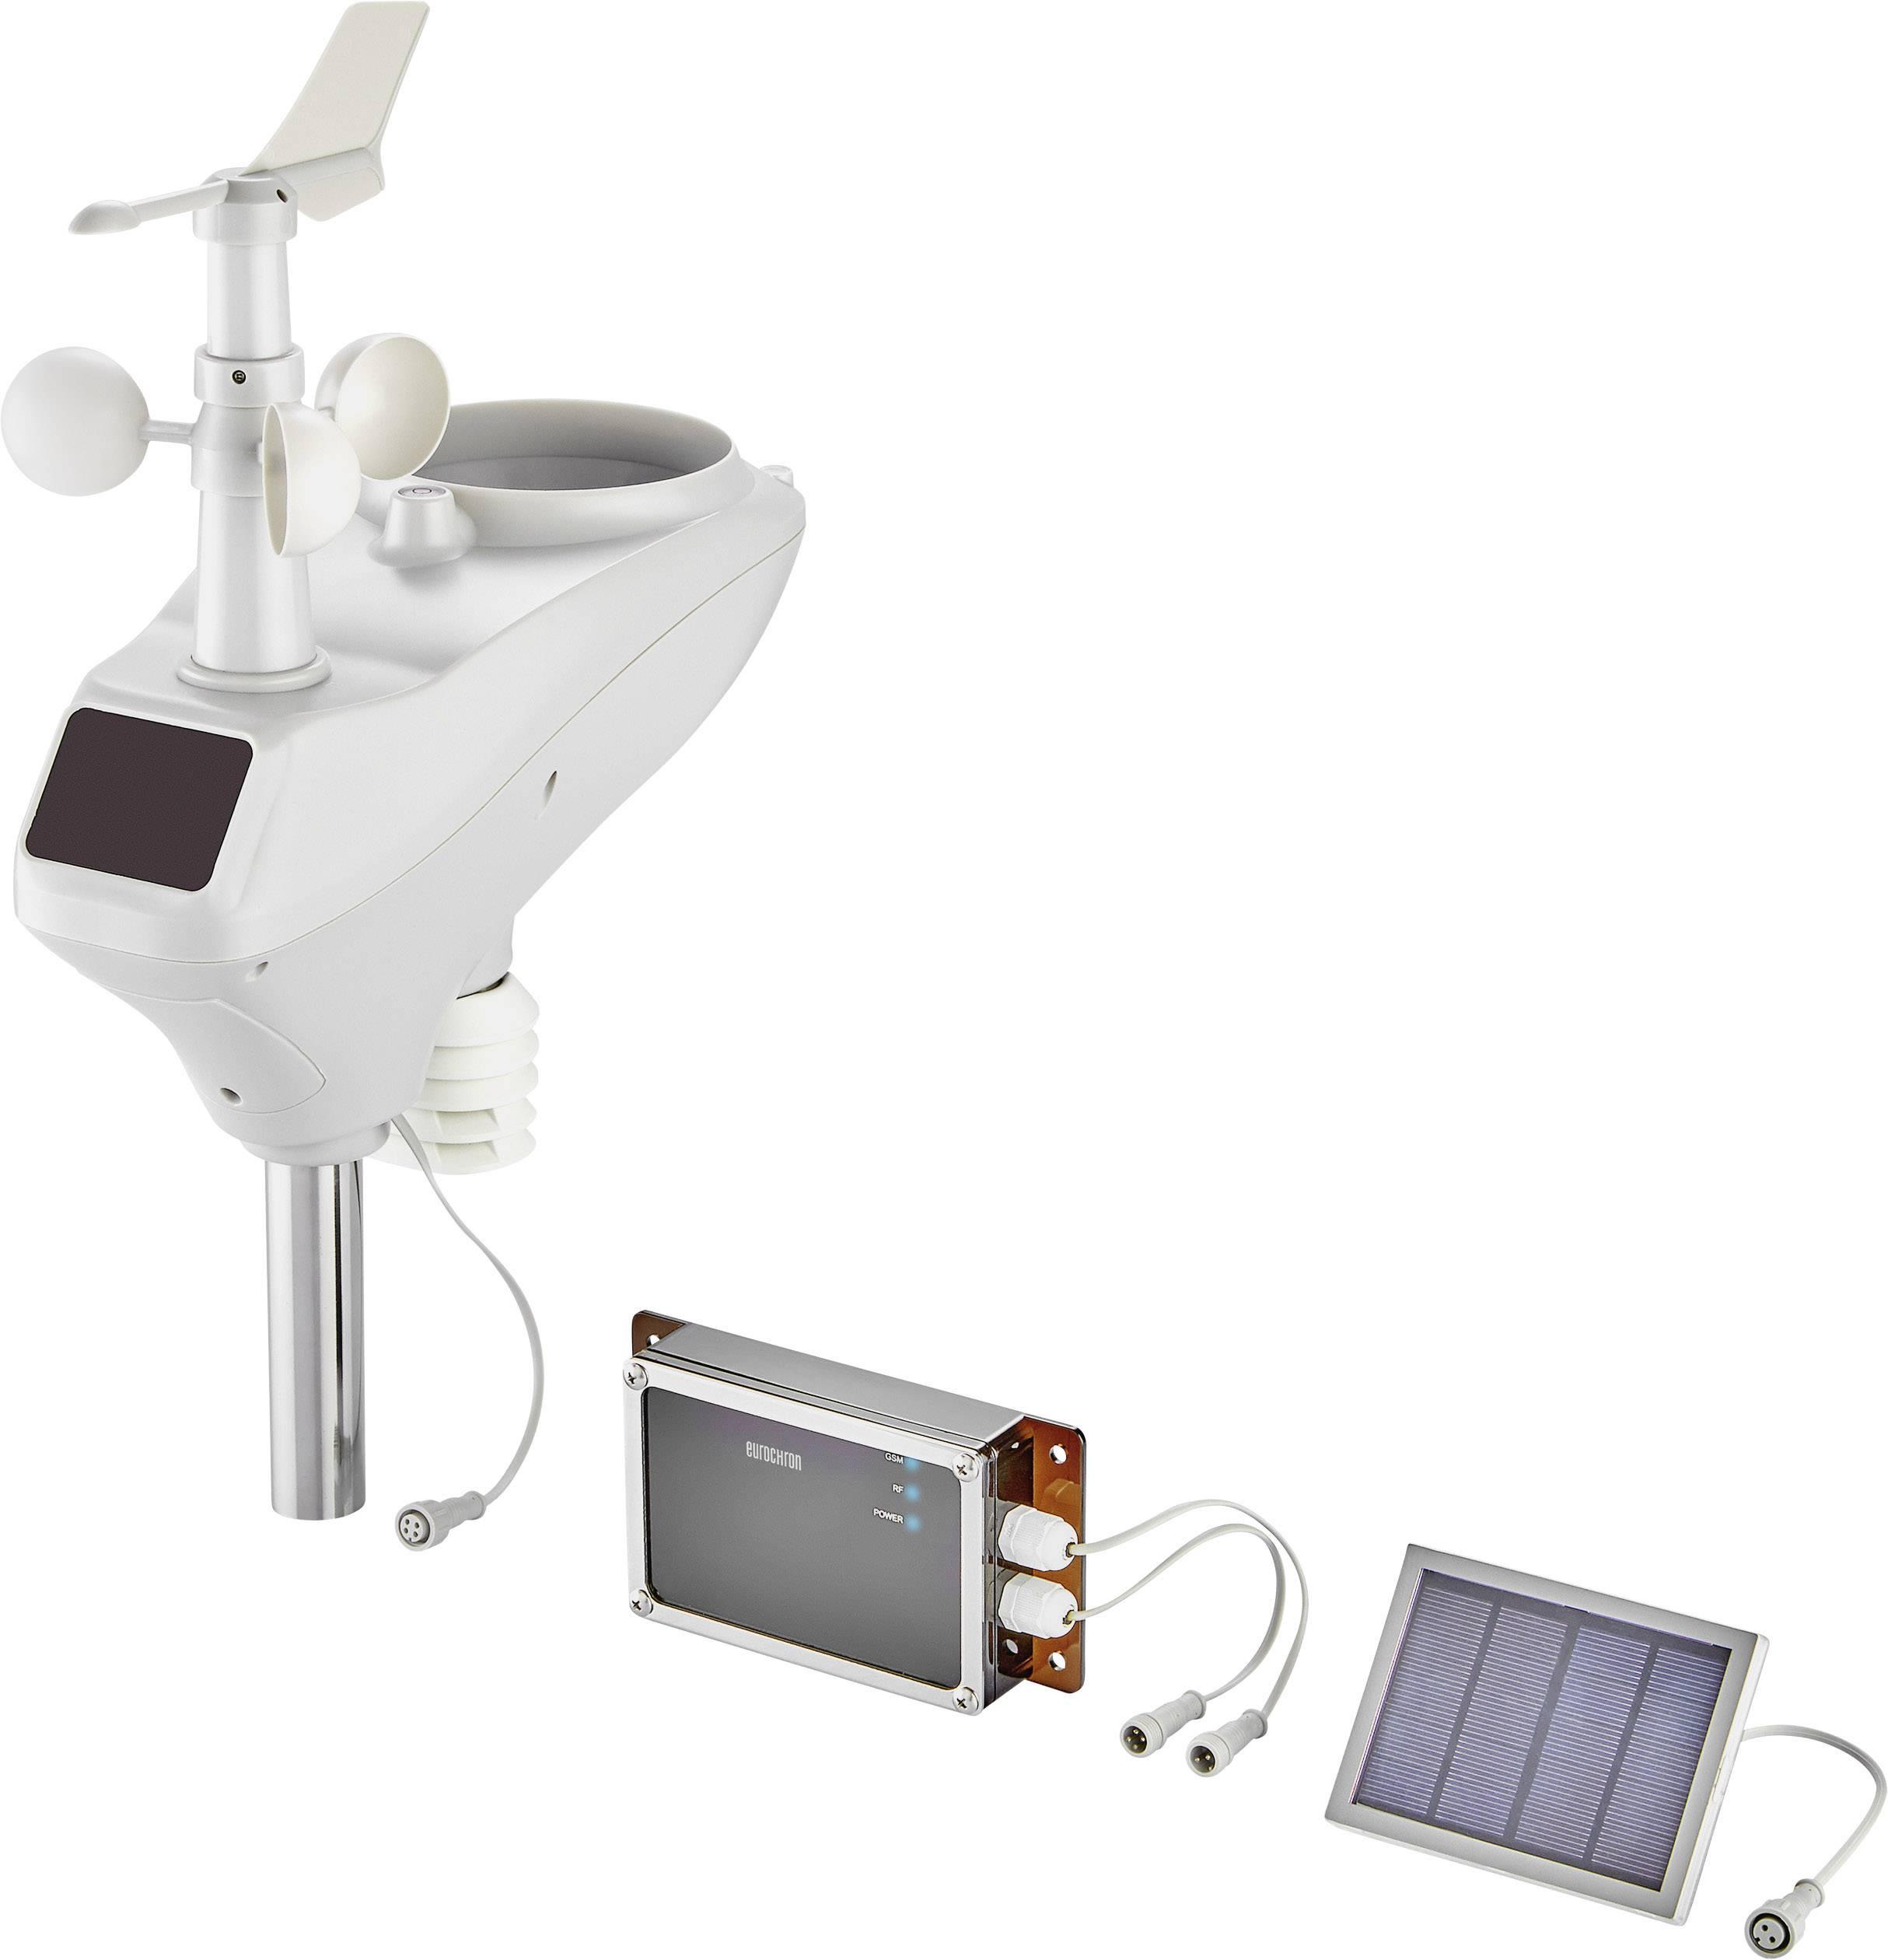 GSM digitálna bezdrôtová meteostanica Eurochron EGWS1000